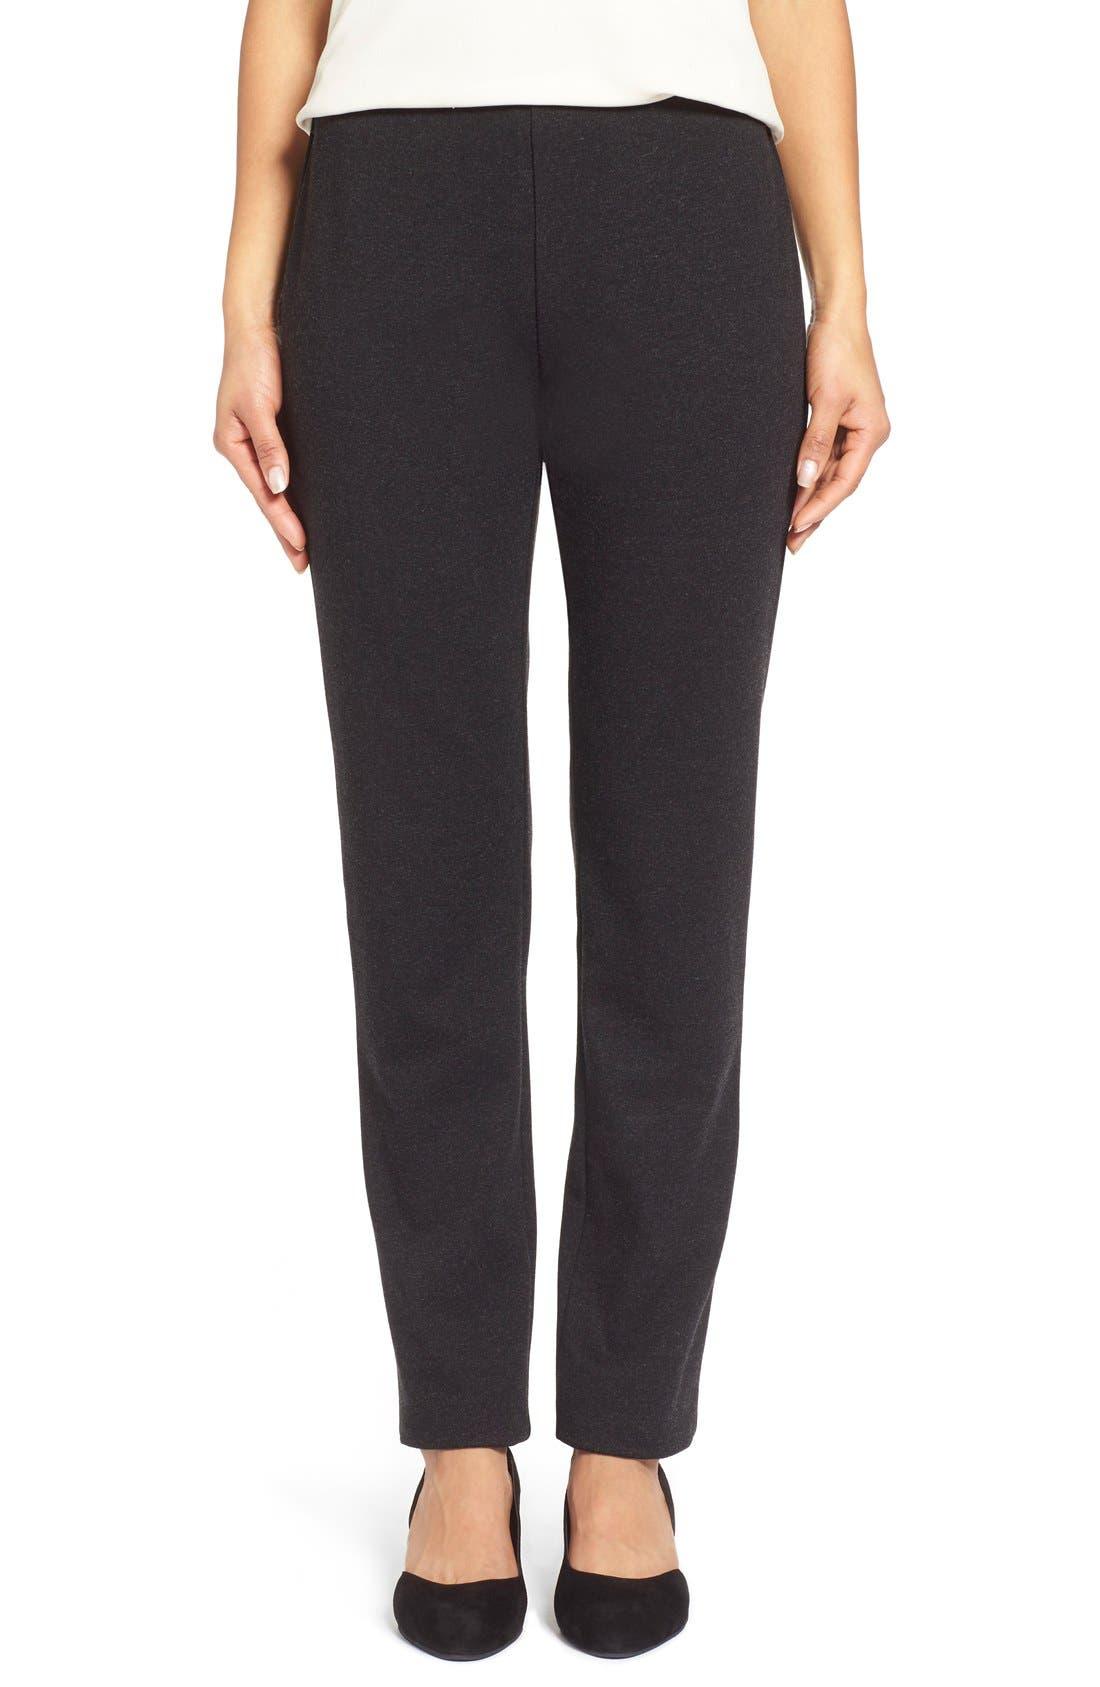 Alternate Image 1 Selected - Eileen Fisher Skinny Ponte Pants (Regular & Petite)